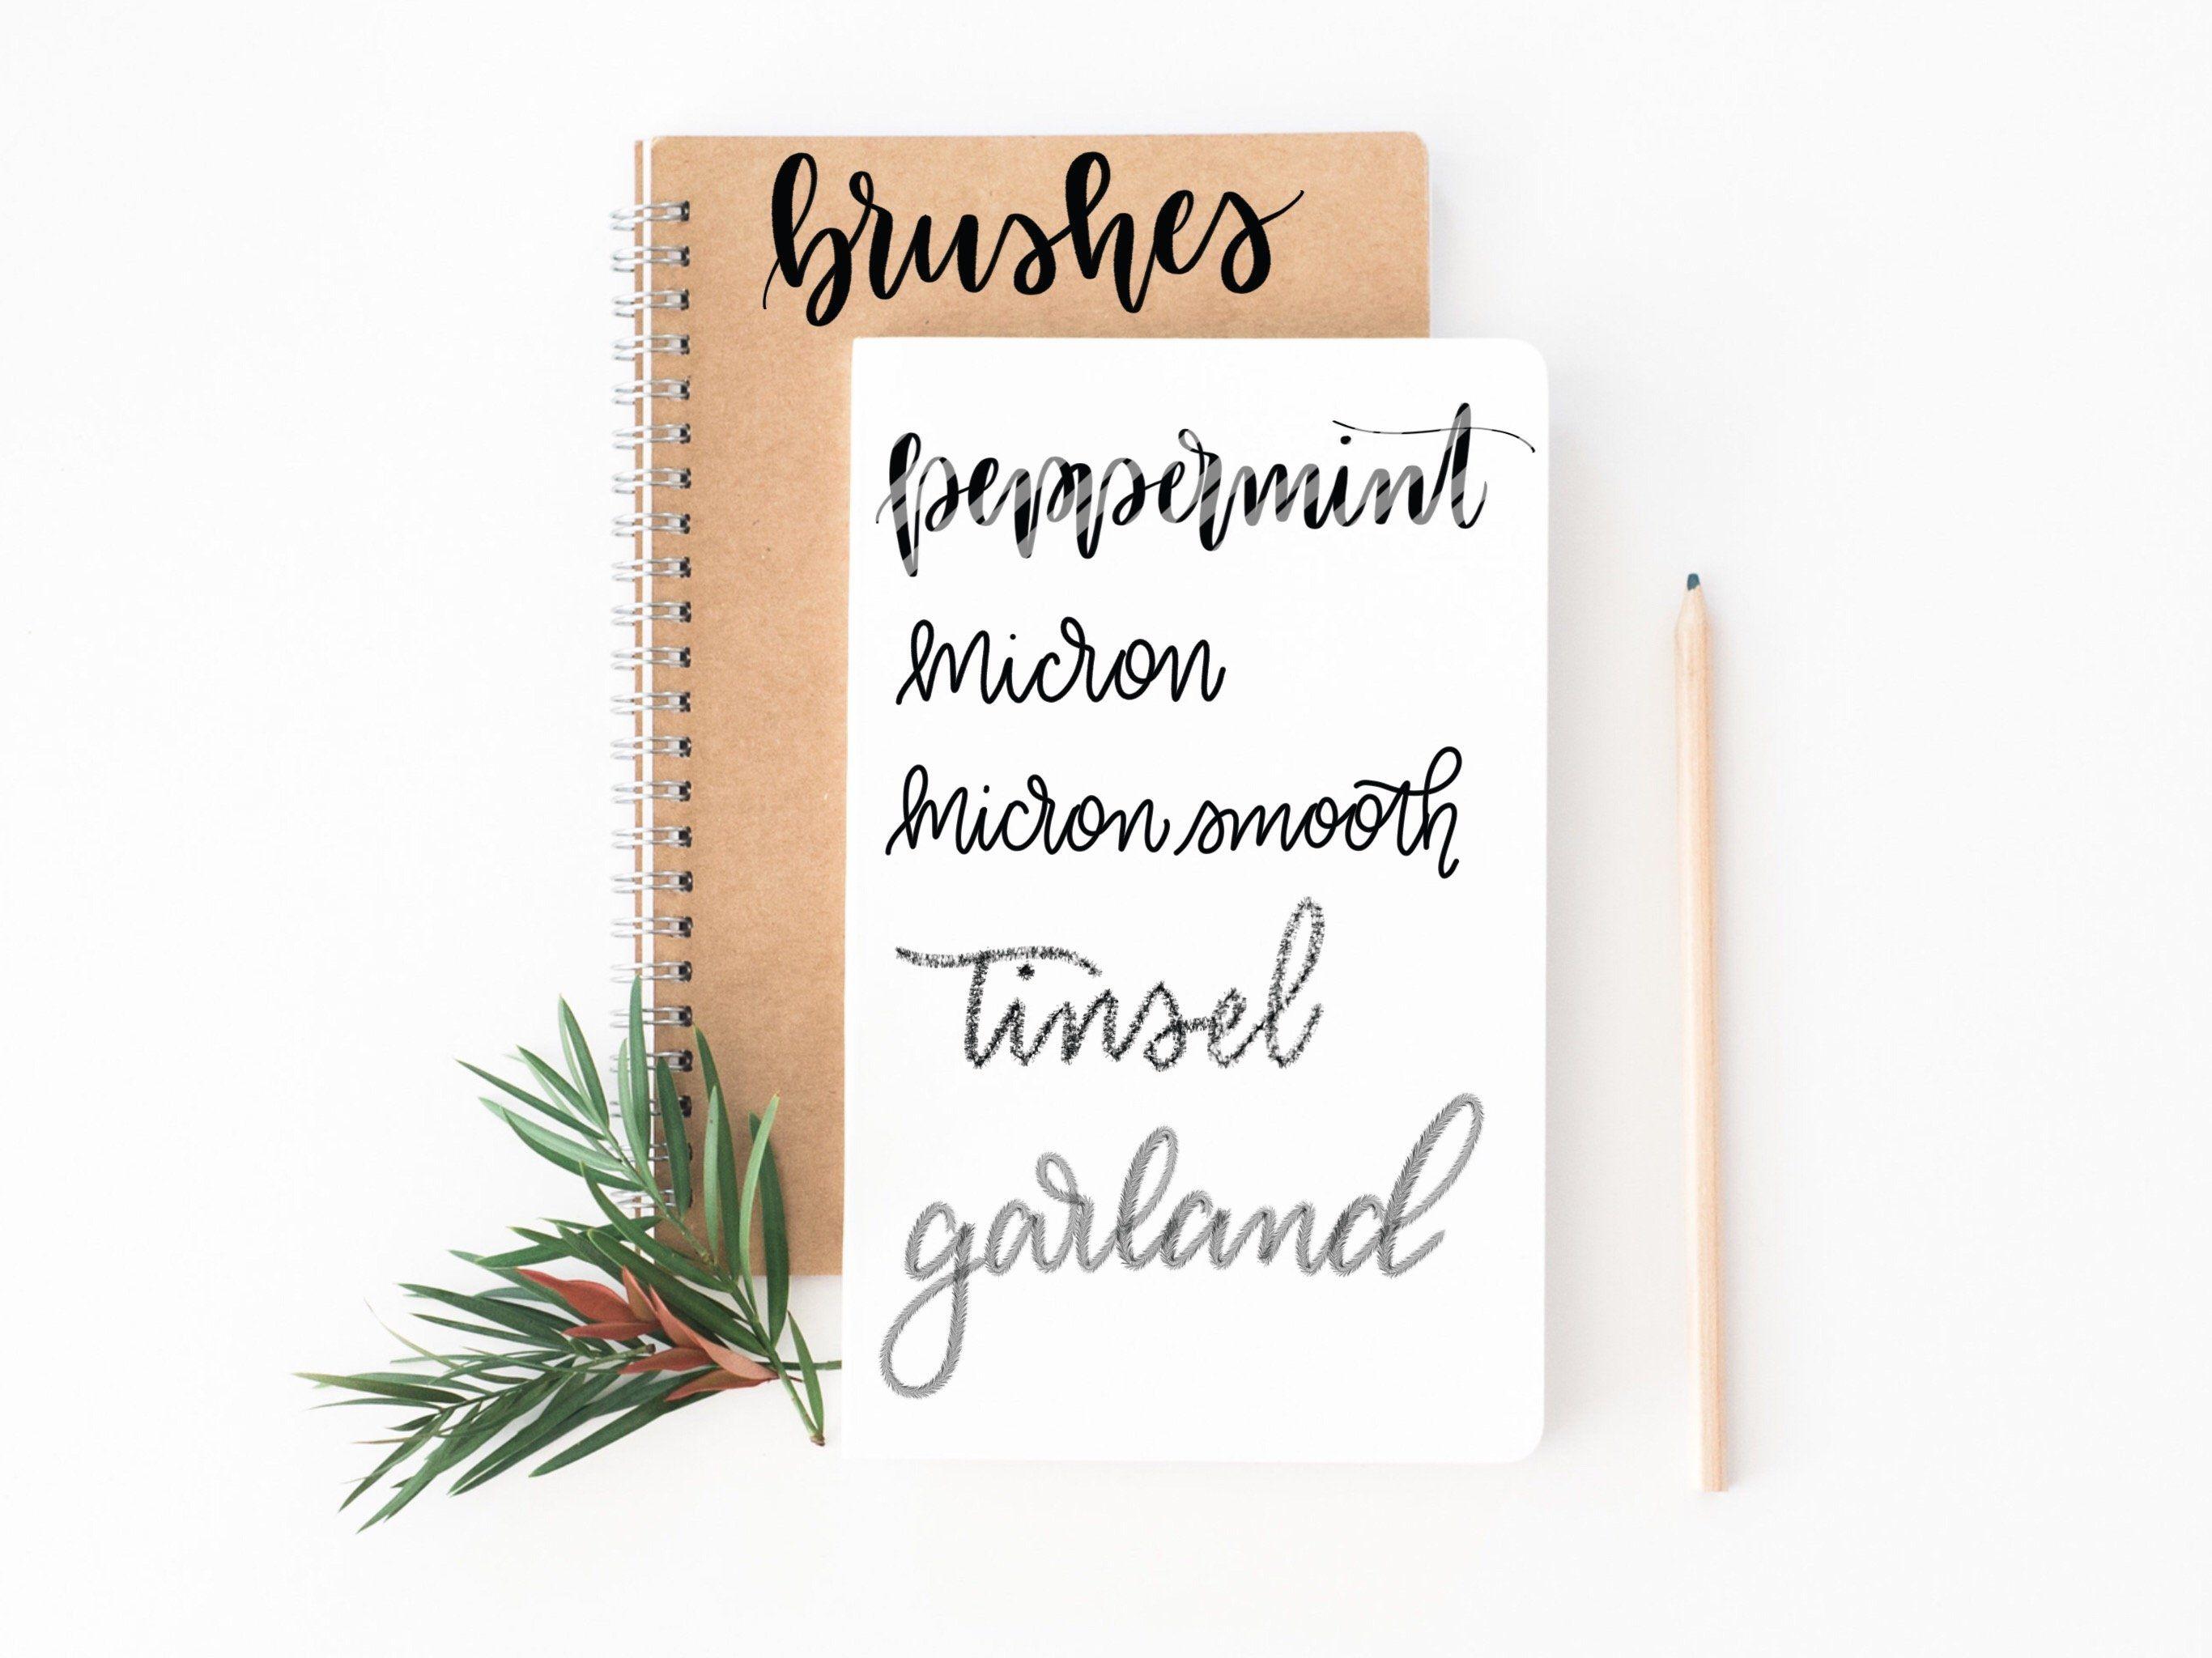 Procreate Christmas Bundle Procreate Bundle Christmas Ad Tinsel Garland Stocking Tree Christmas